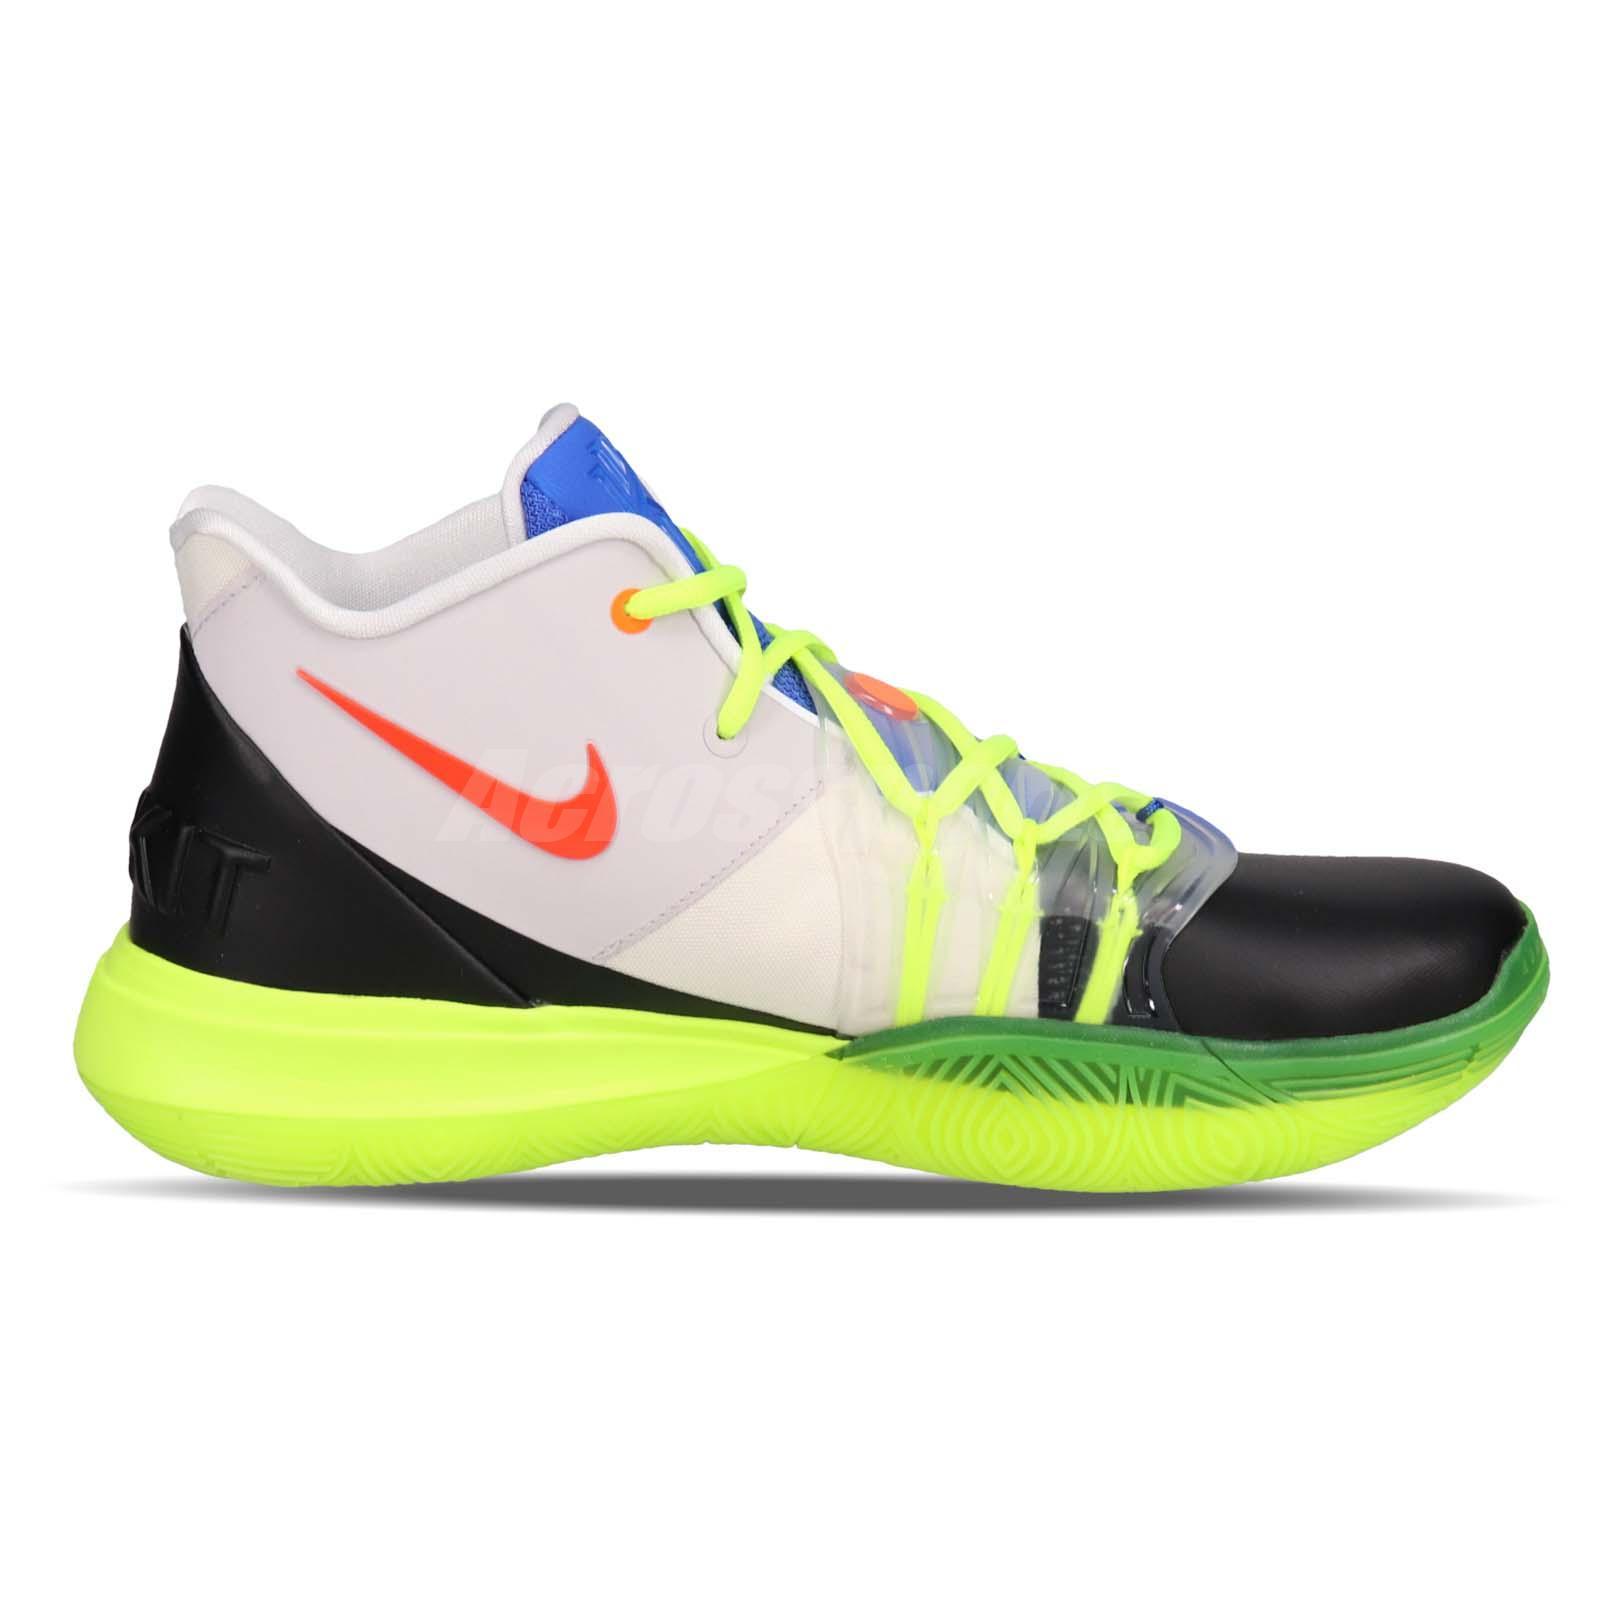 ad4275579235 Nike Kyrie 5 EP X ROKIT Multi-Color NBA All Star 2019 Basketball ...